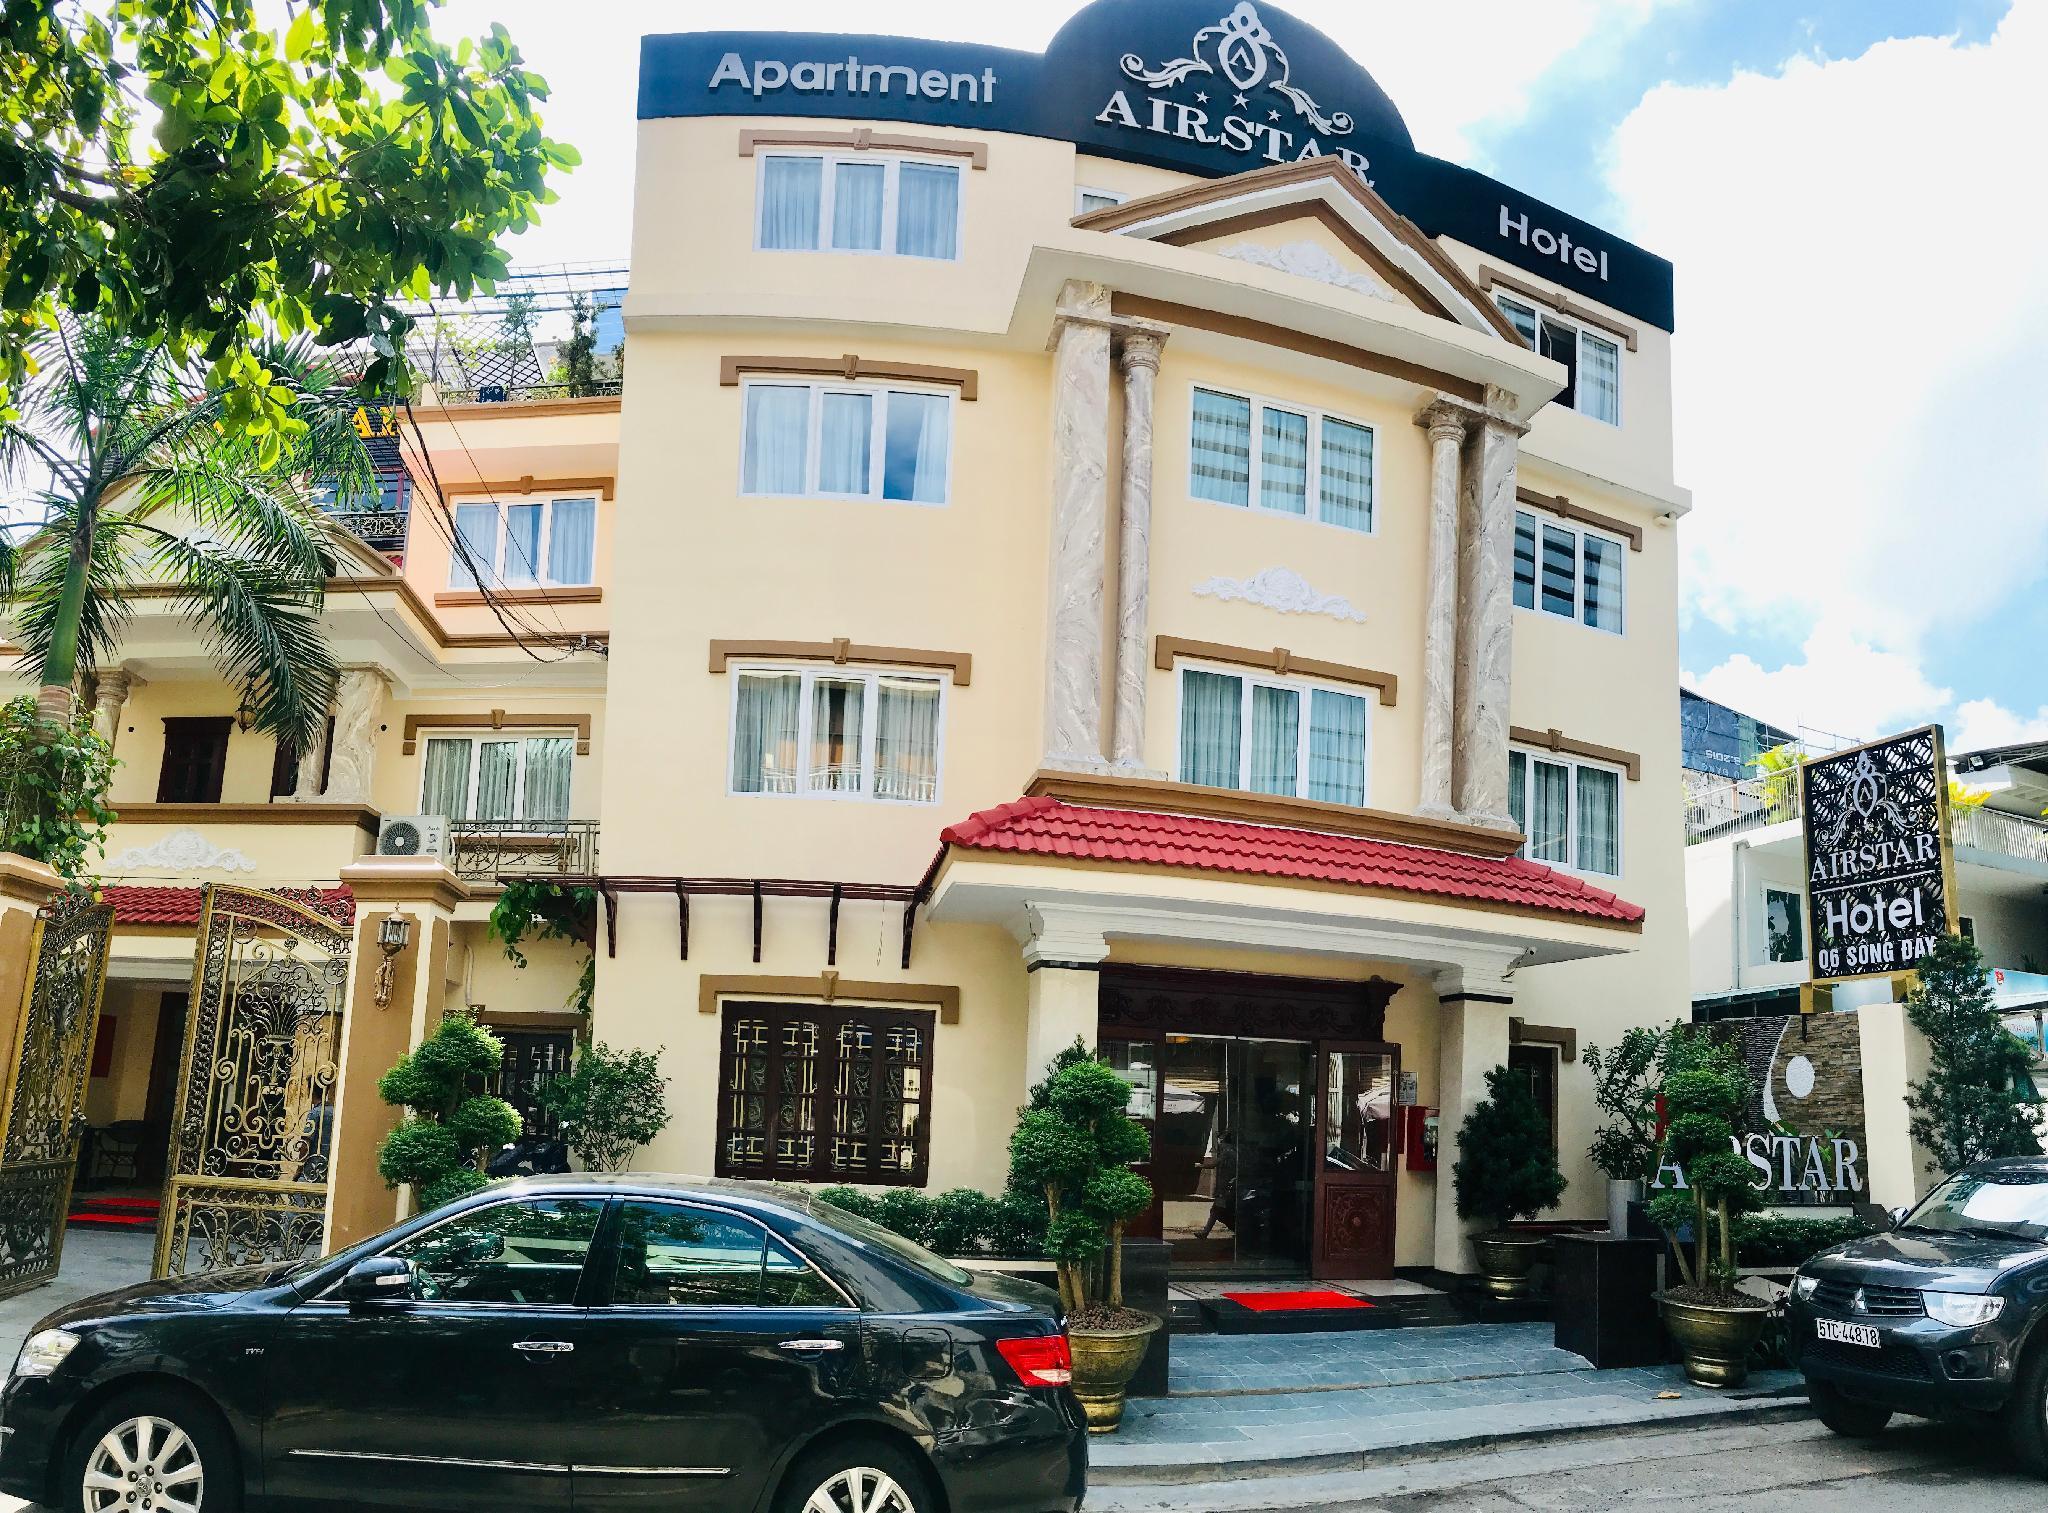 Airstar Hotel And Apartments